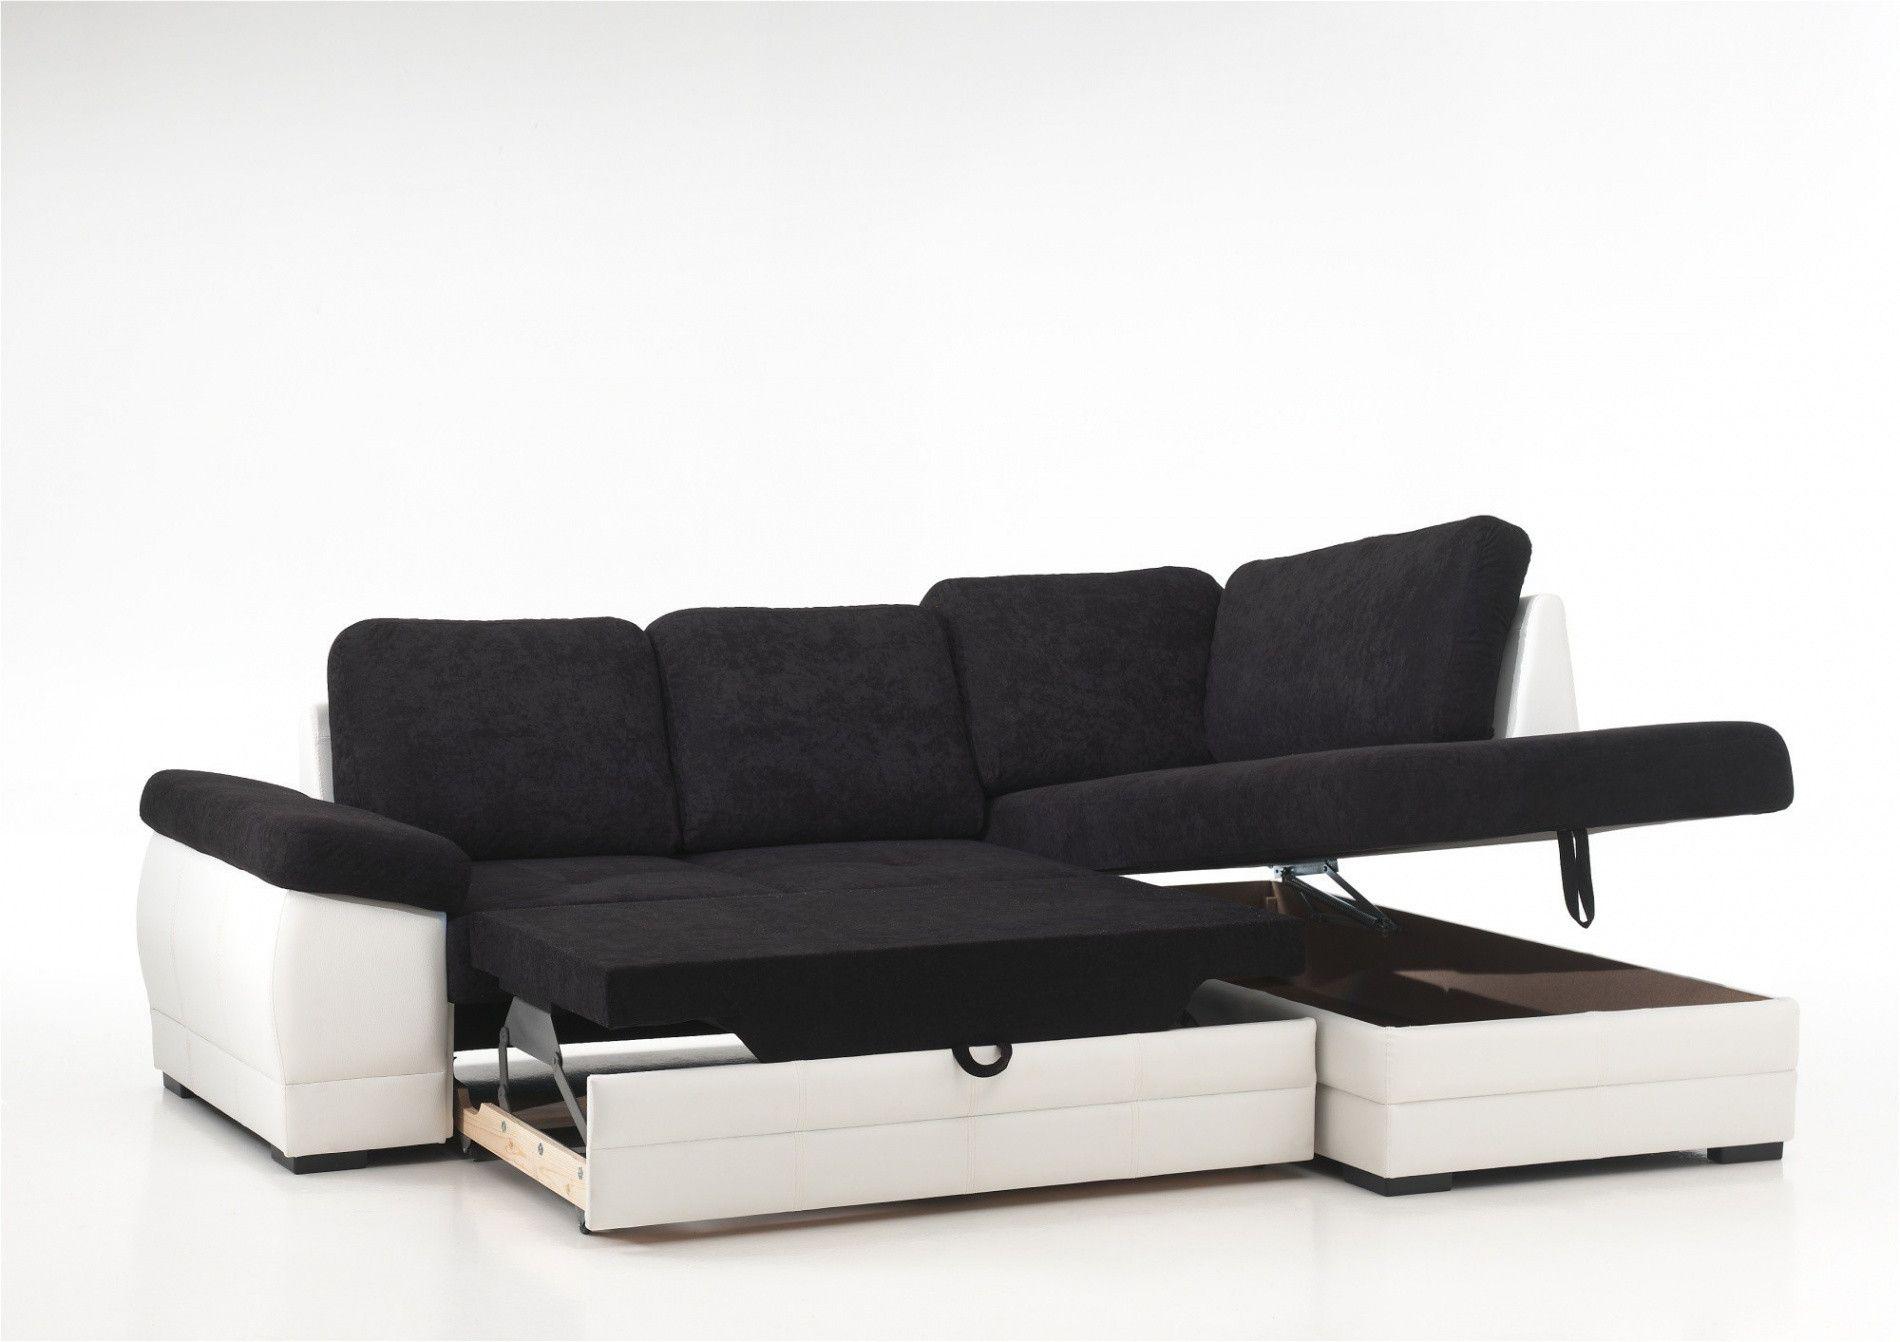 Impressionnant Canapé D Angle Cocooning Idées Inspirantes ... pour Canapé Fer Forgé Conforama